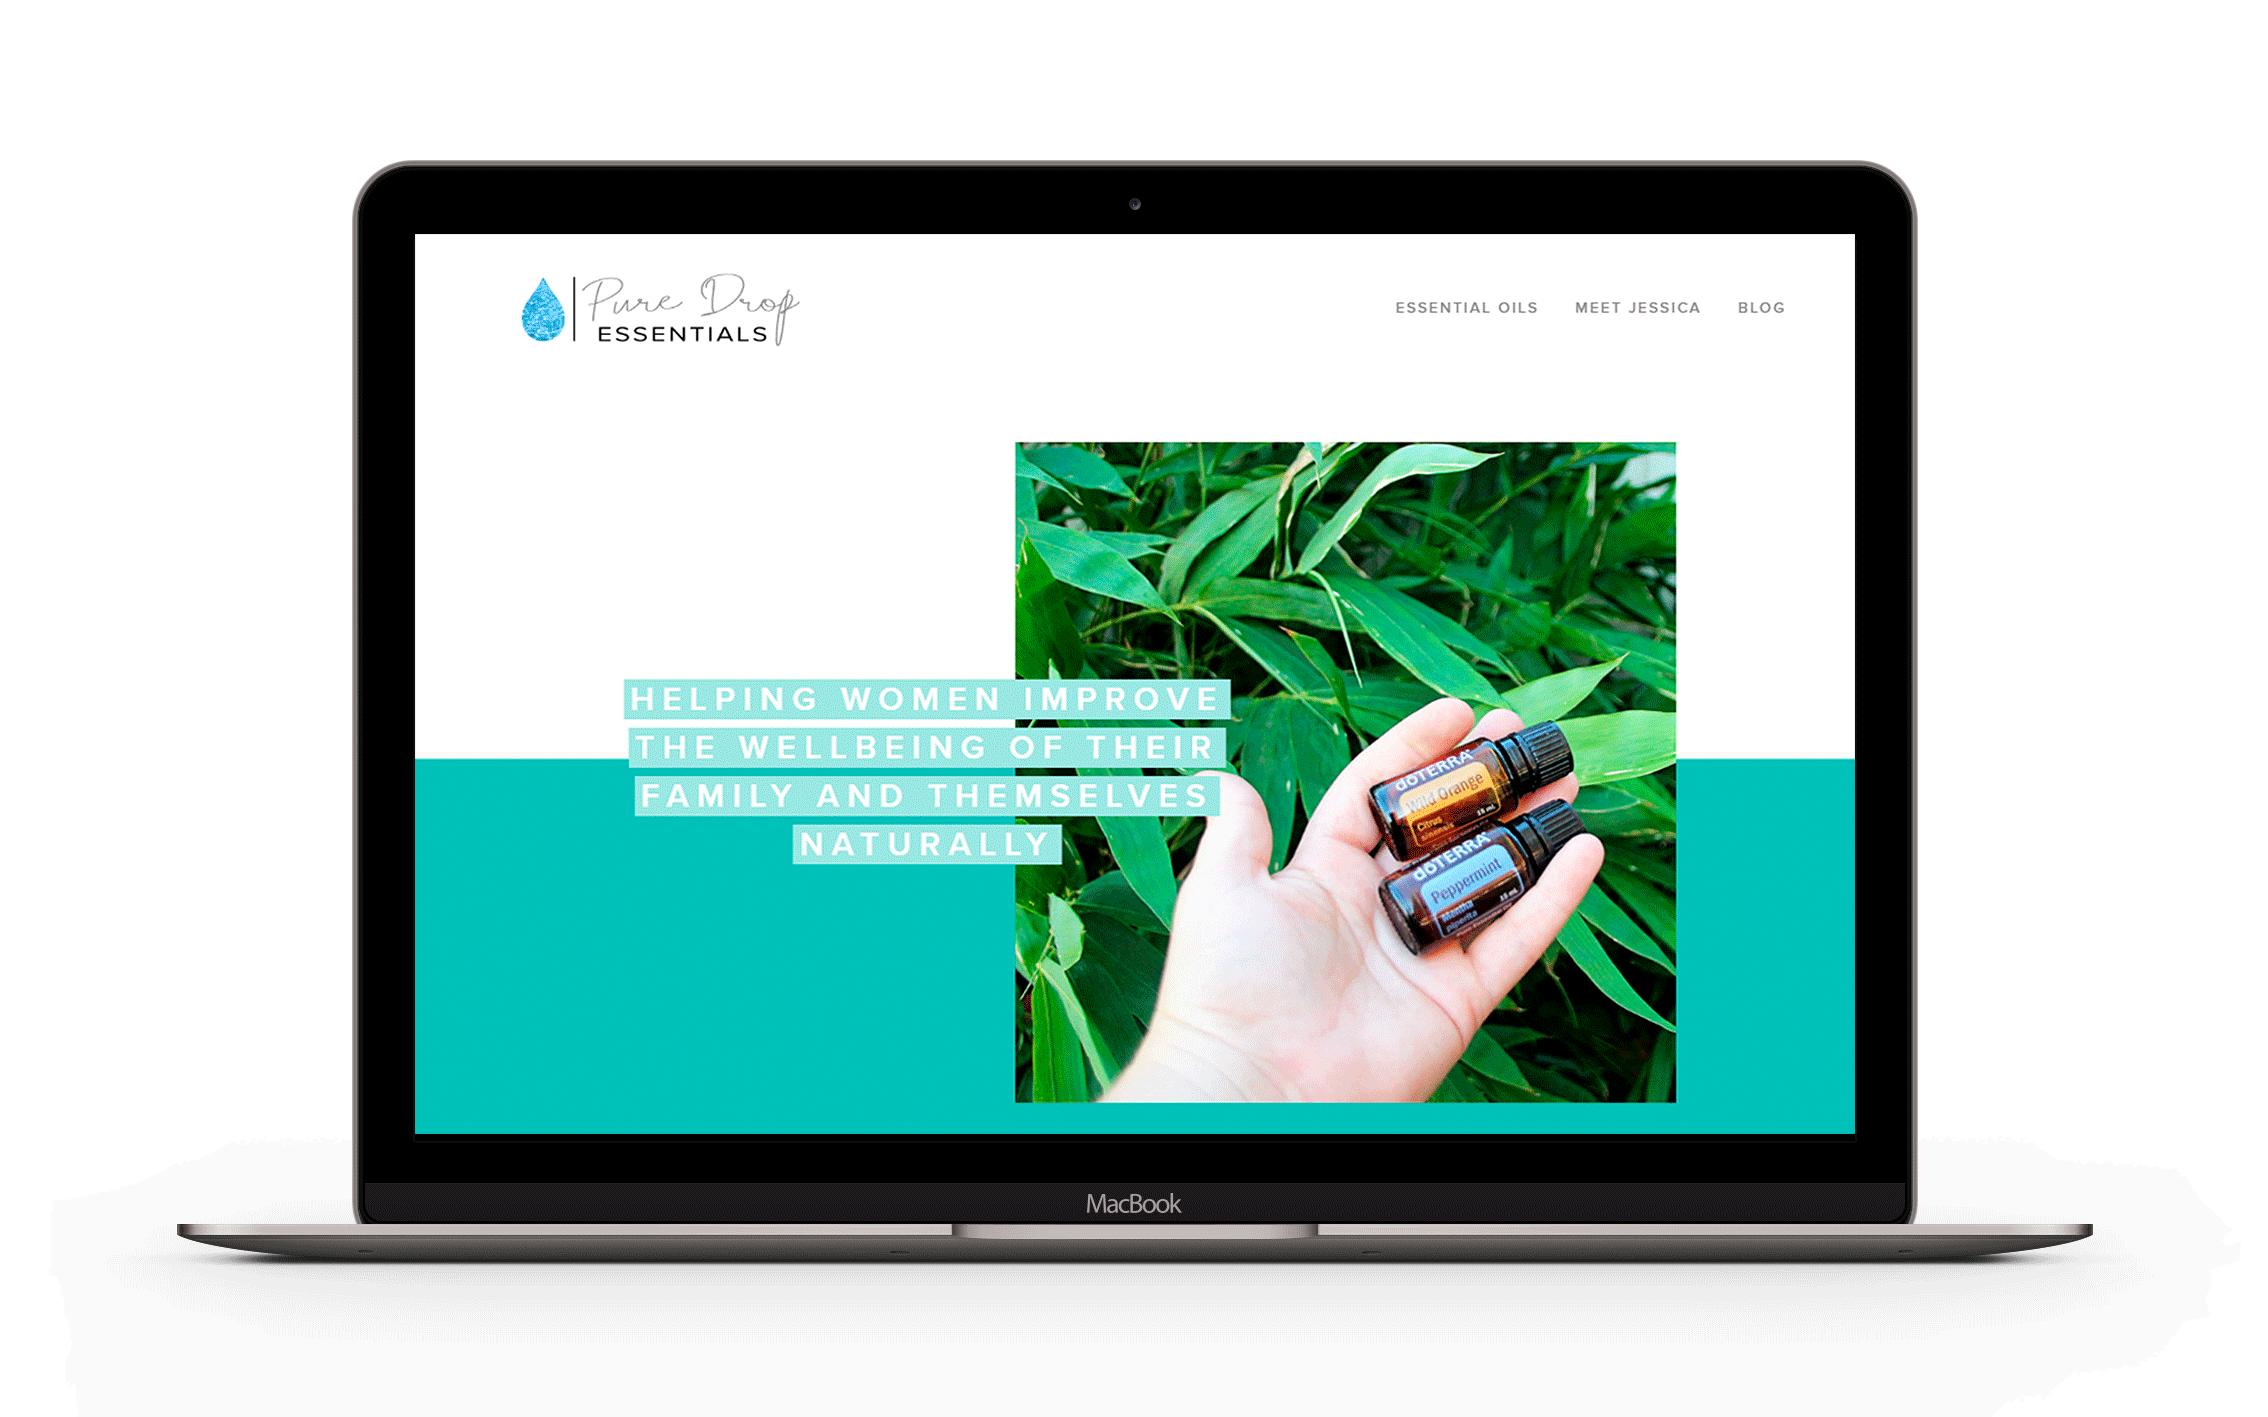 Squarespace Website Design for Pure Drop Essentials